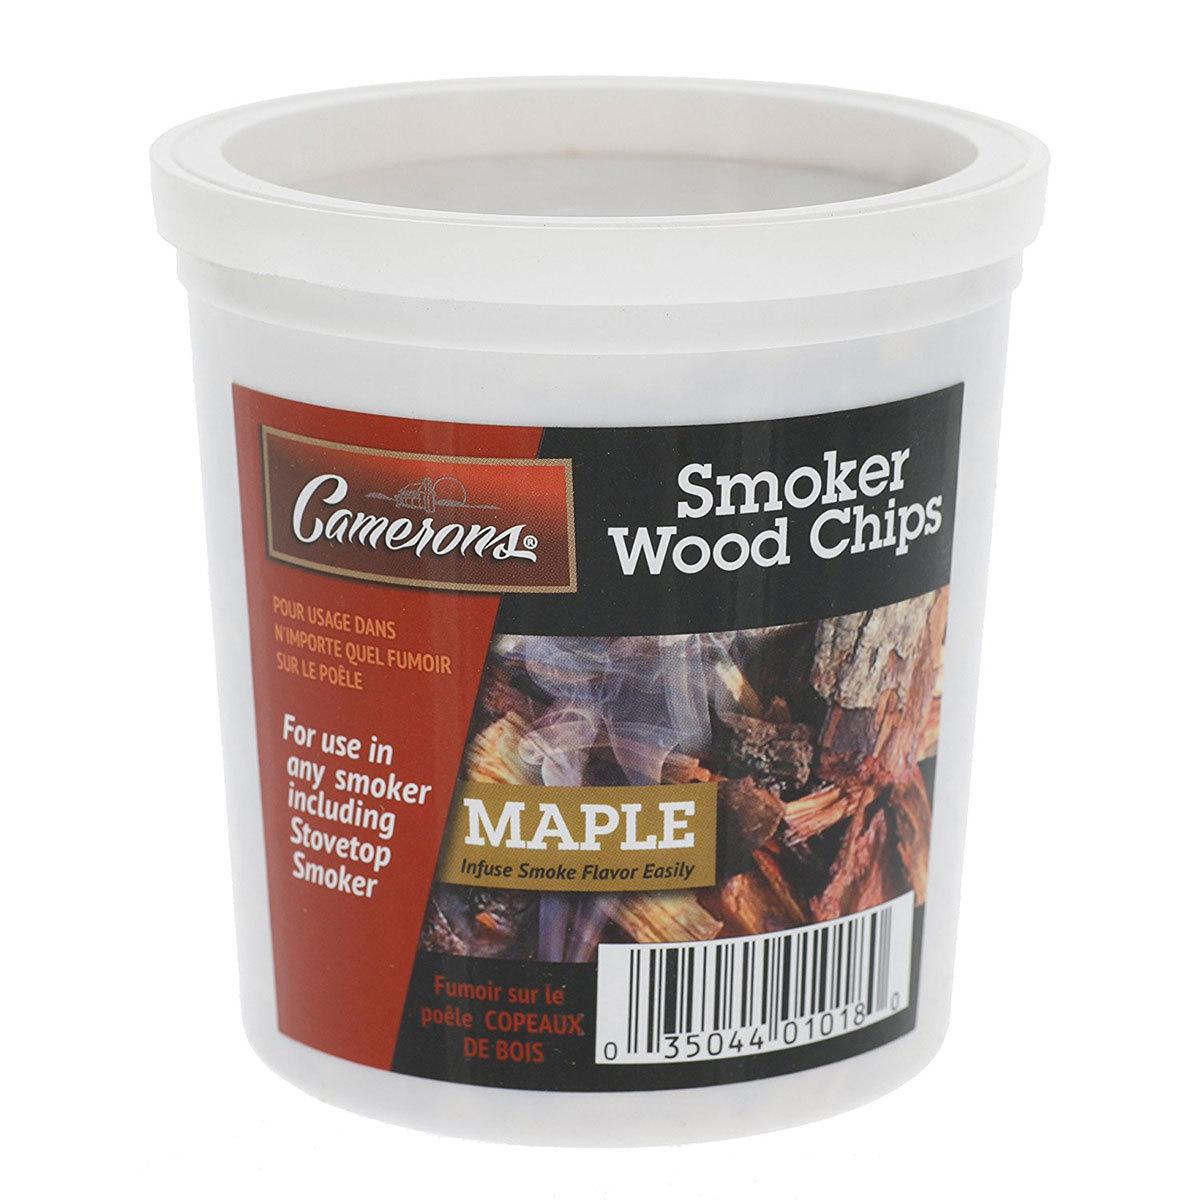 Camerons, Indoor Smoking Chip, Maple